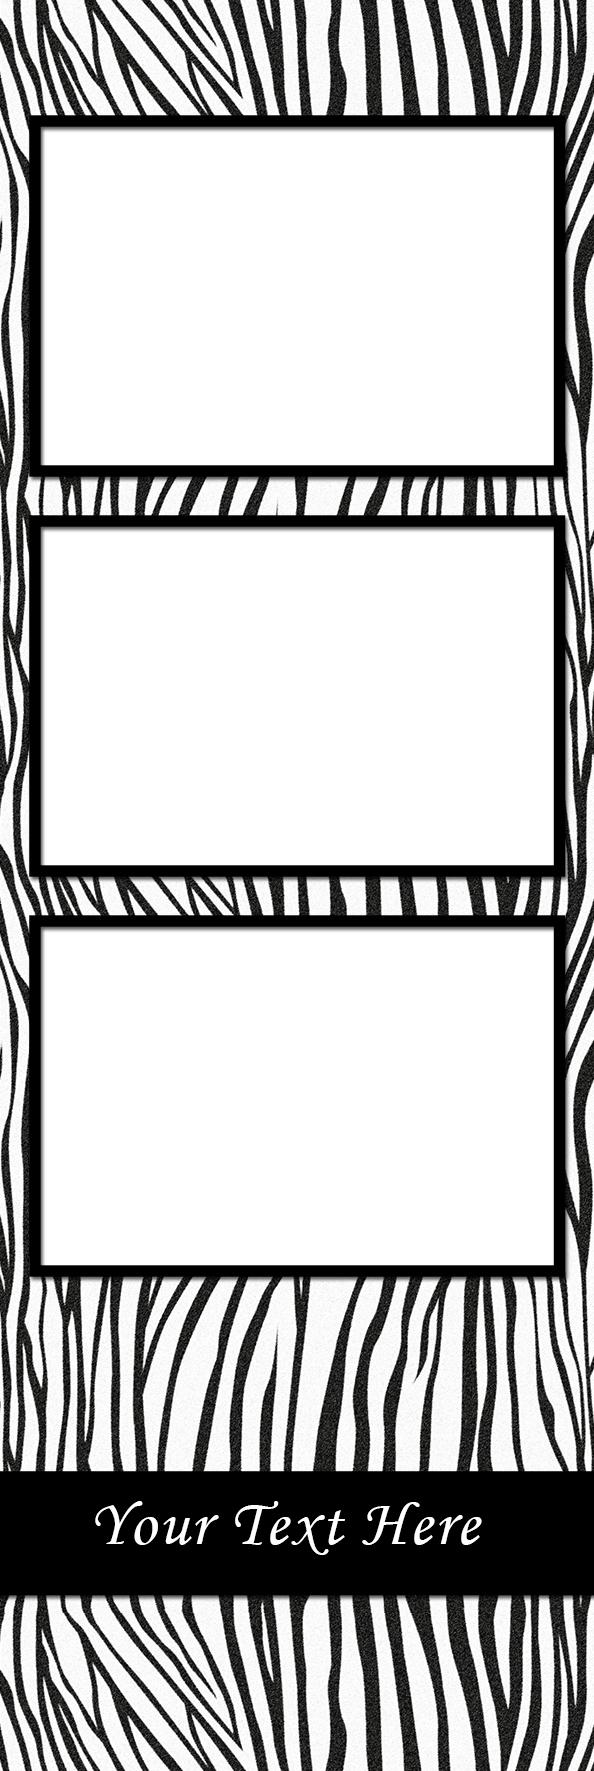 Texture_Zebra-V-6P.jpg